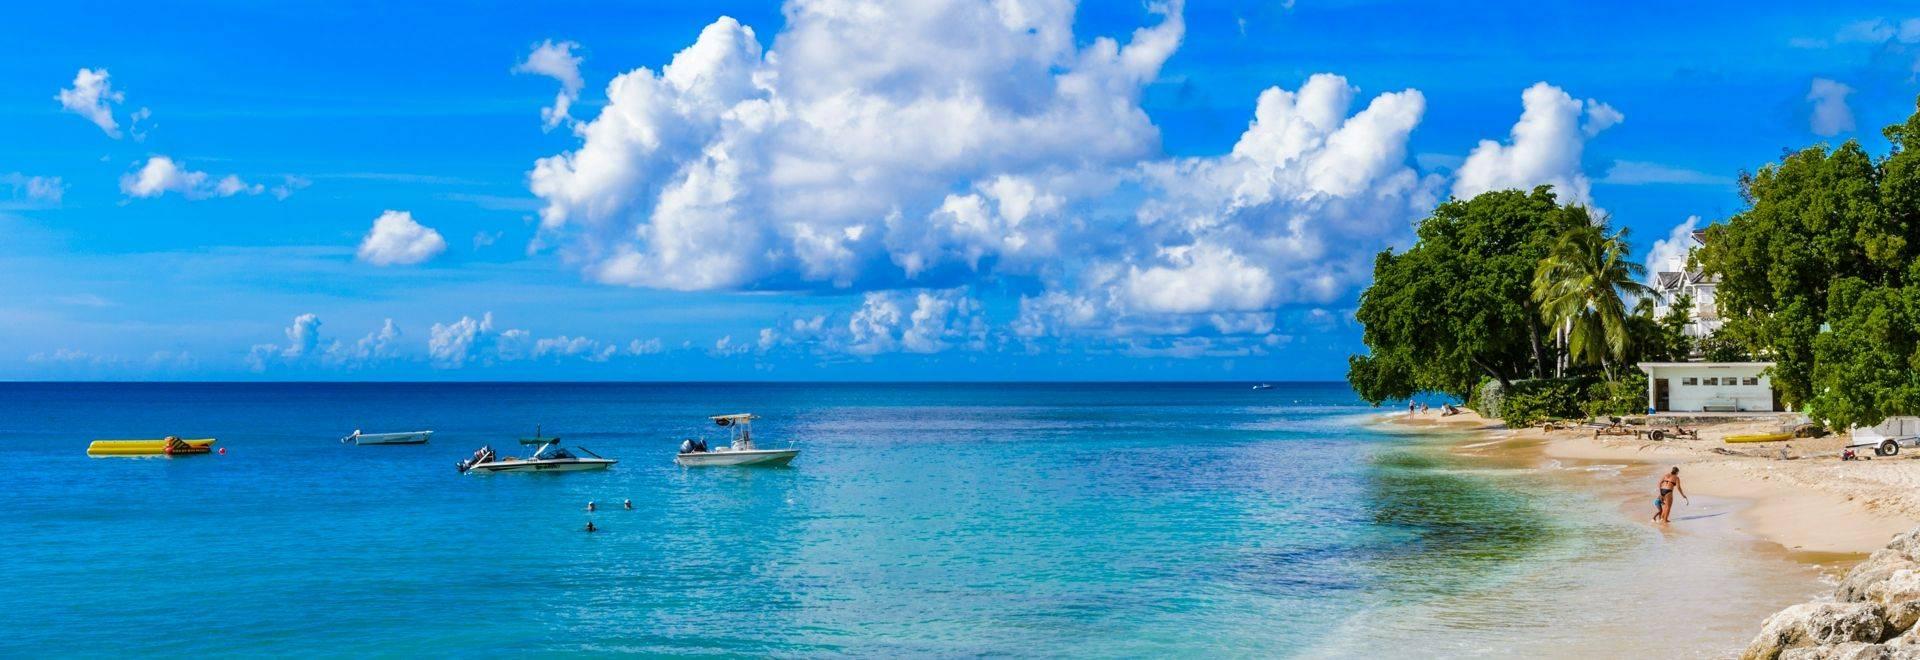 Shutterstock 168014735 Coast Of The Carribean Sea, Bridgetown